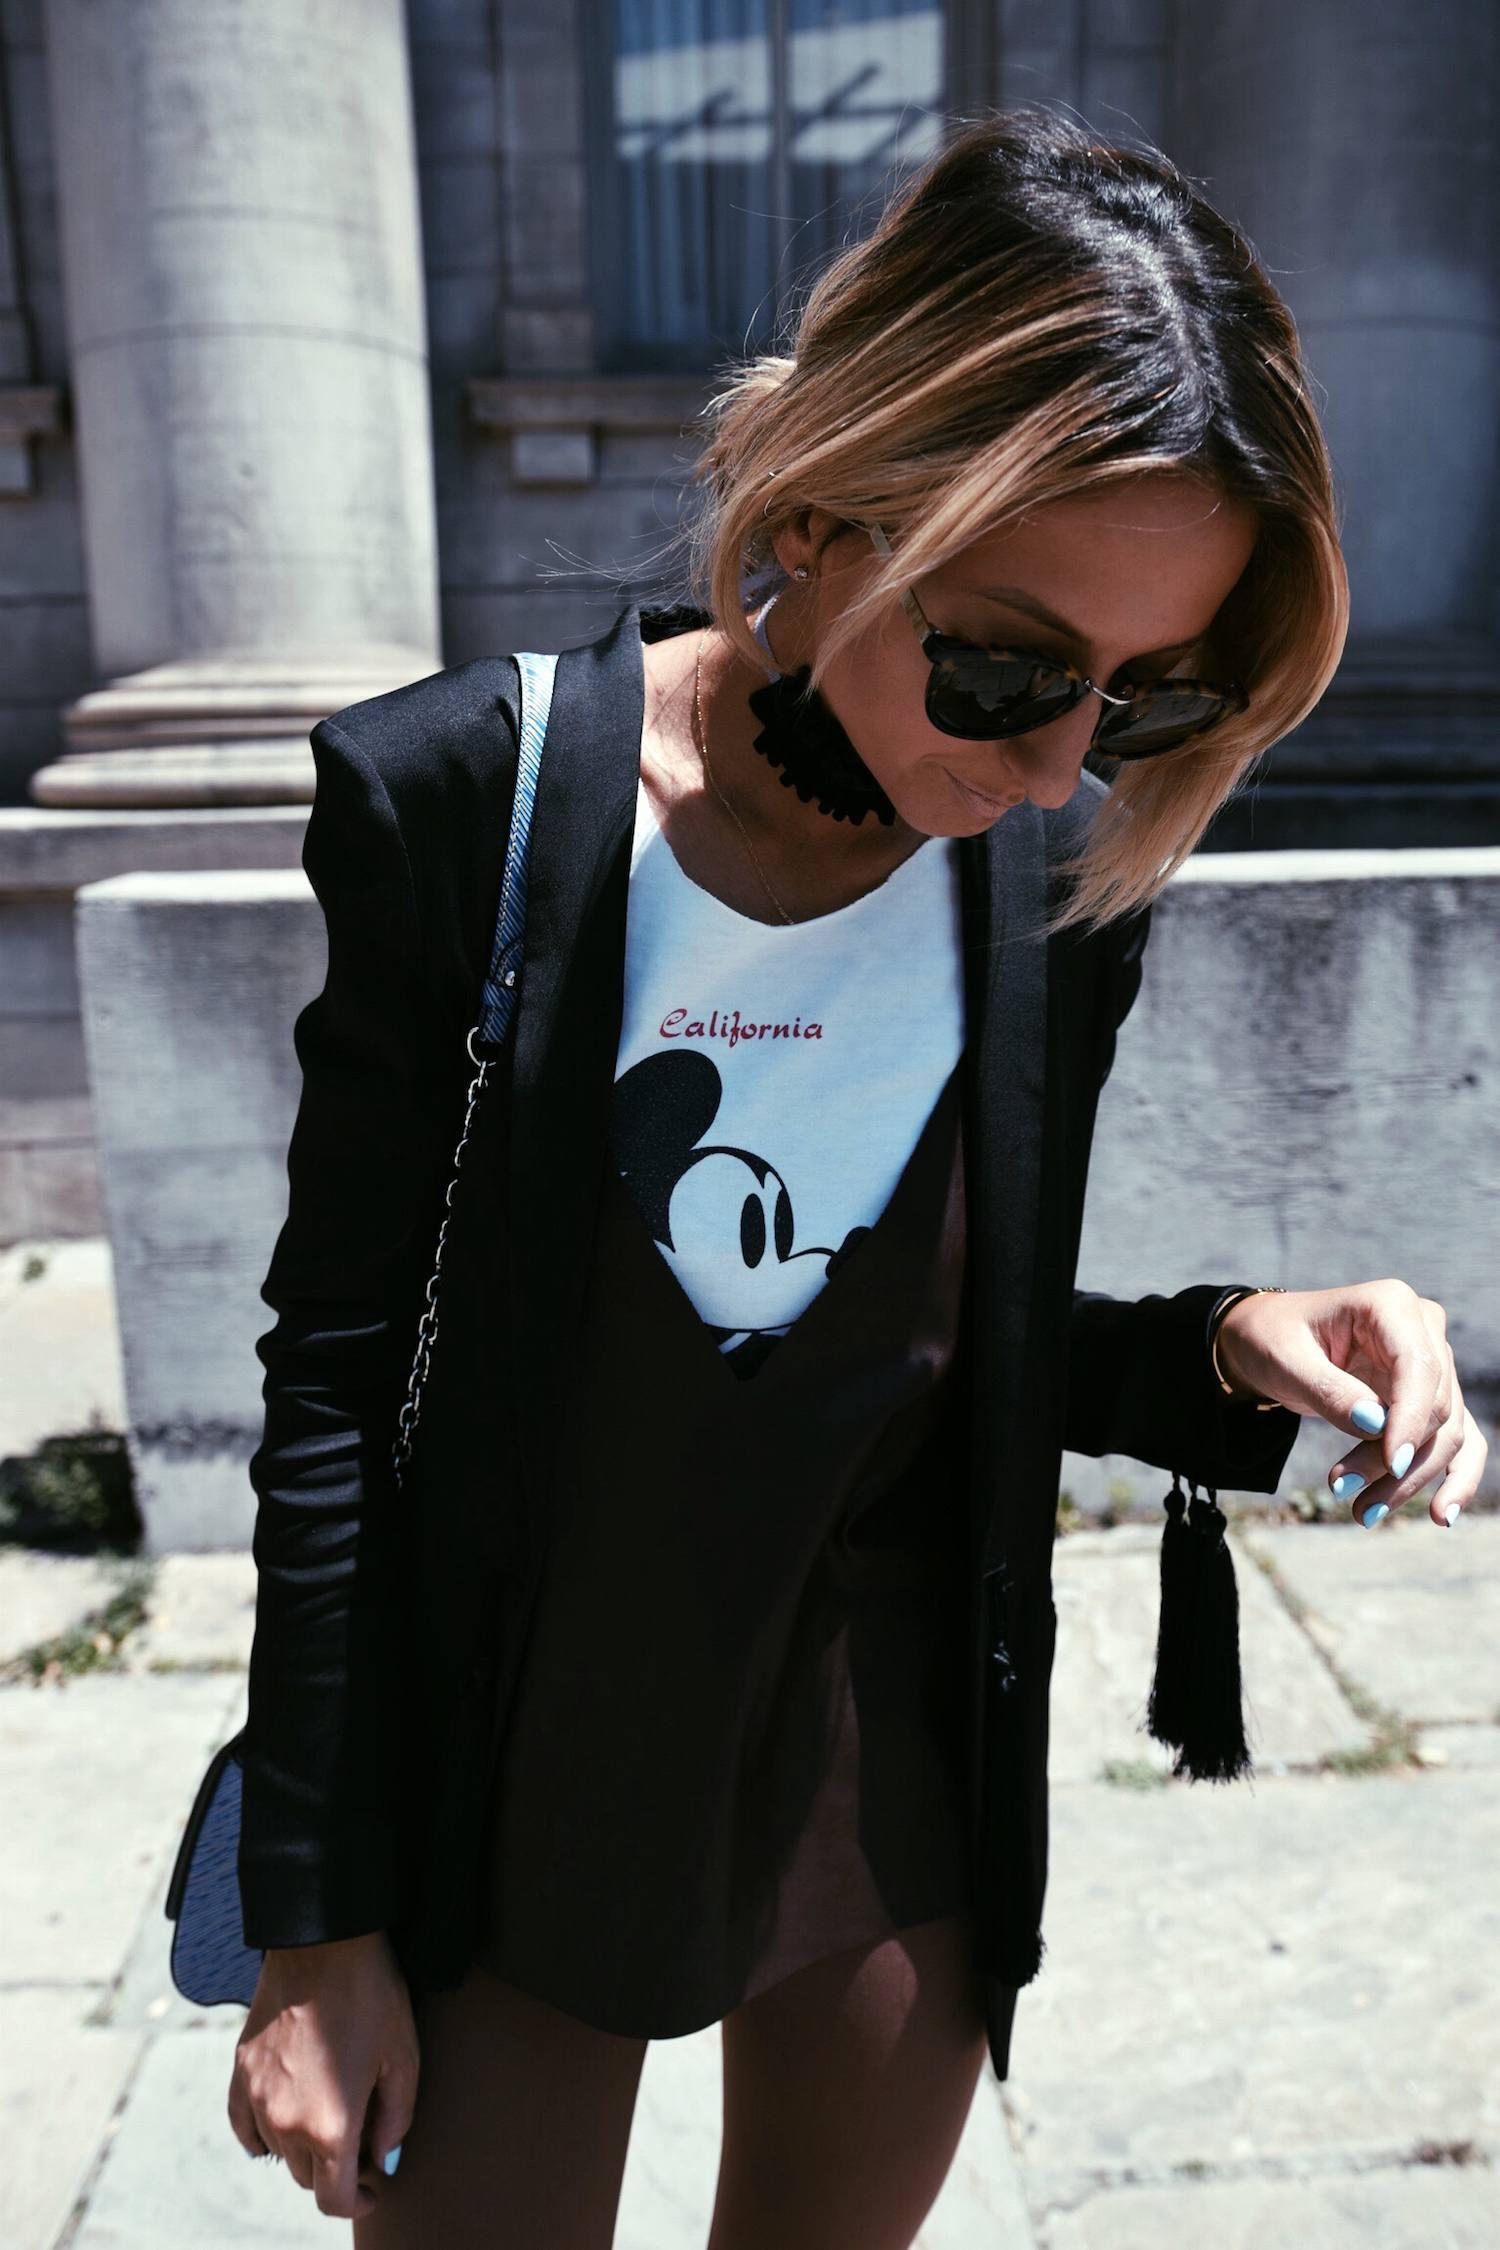 bloglovin breakthrough blogger of the year 2016 winner jetset justine iaboni 06